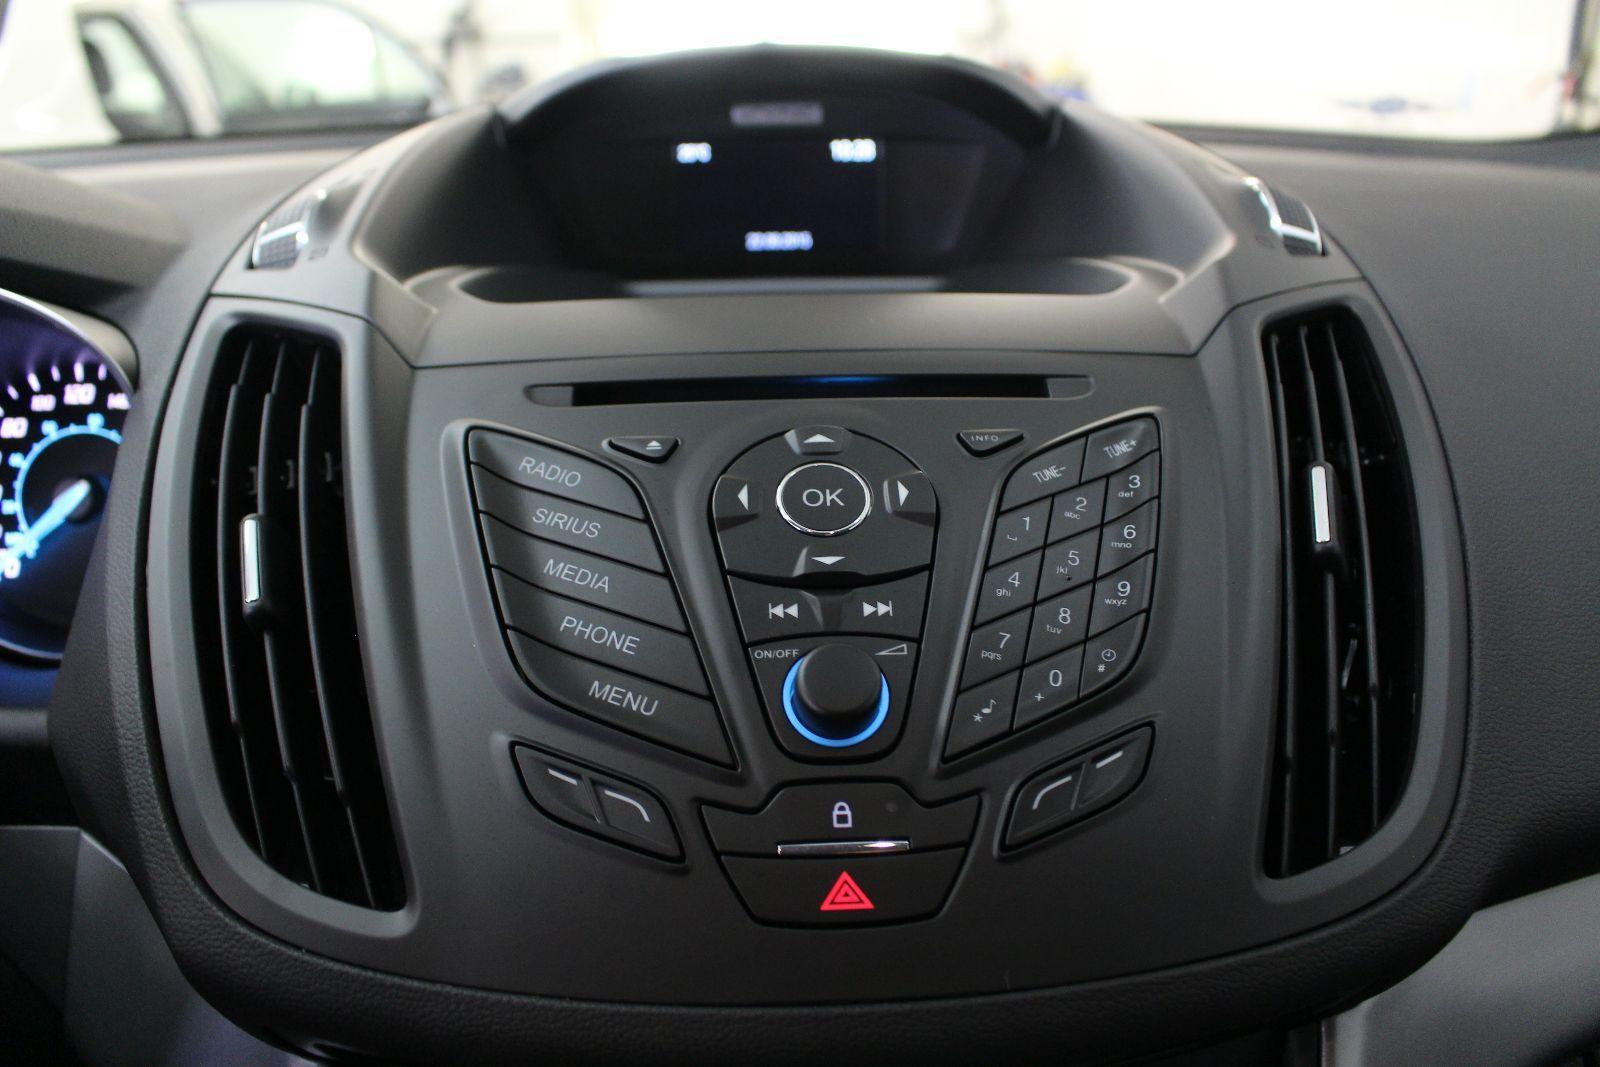 new 2016 ford escape se 1 6l ecoboost automatic 4wd for. Black Bedroom Furniture Sets. Home Design Ideas